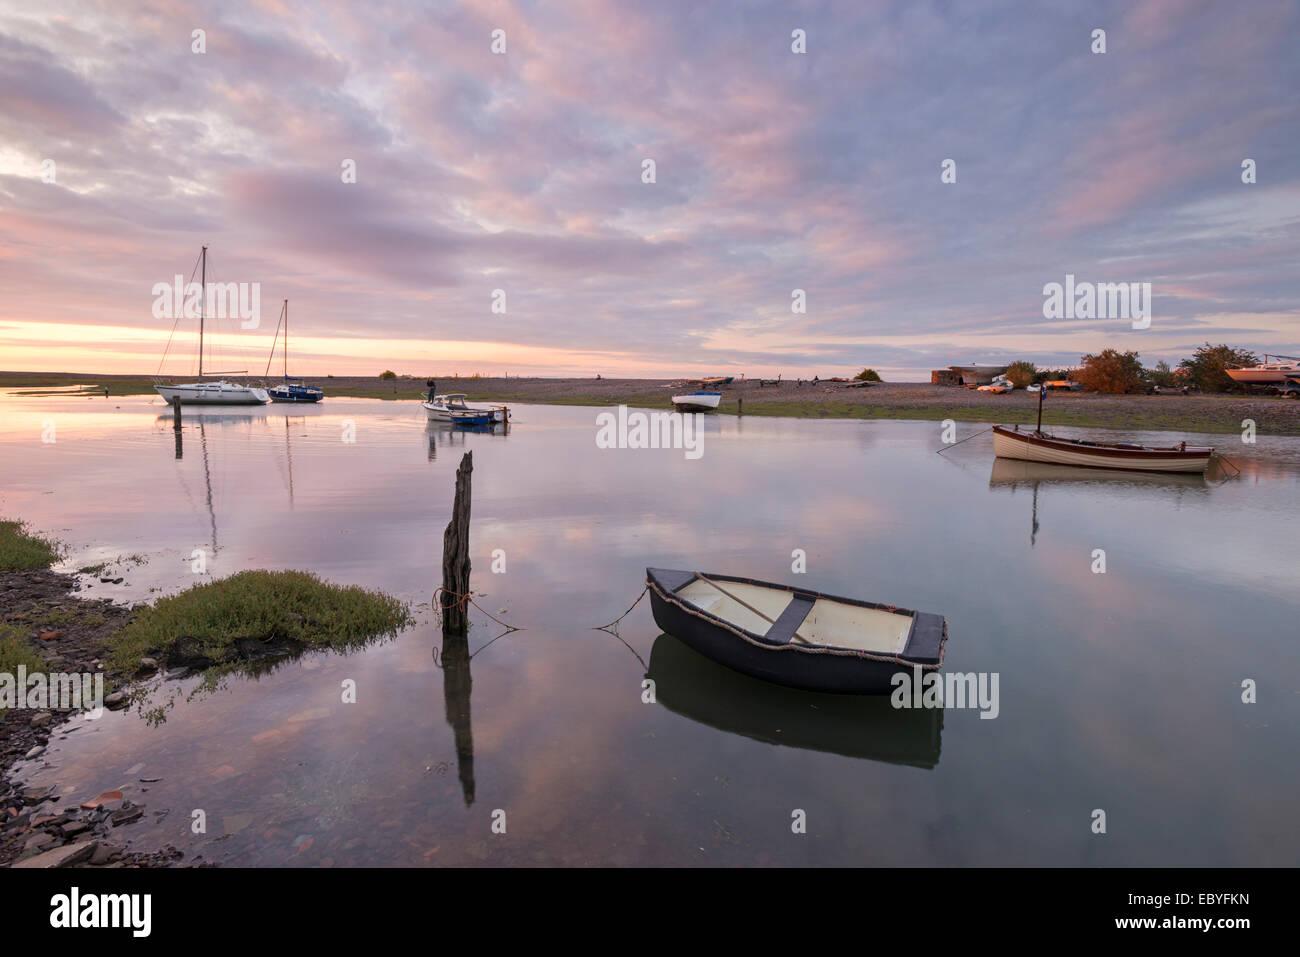 Sunset over Porlock Weir harbour, Exmoor, Somerset, England. Summer (July) 2014. - Stock Image